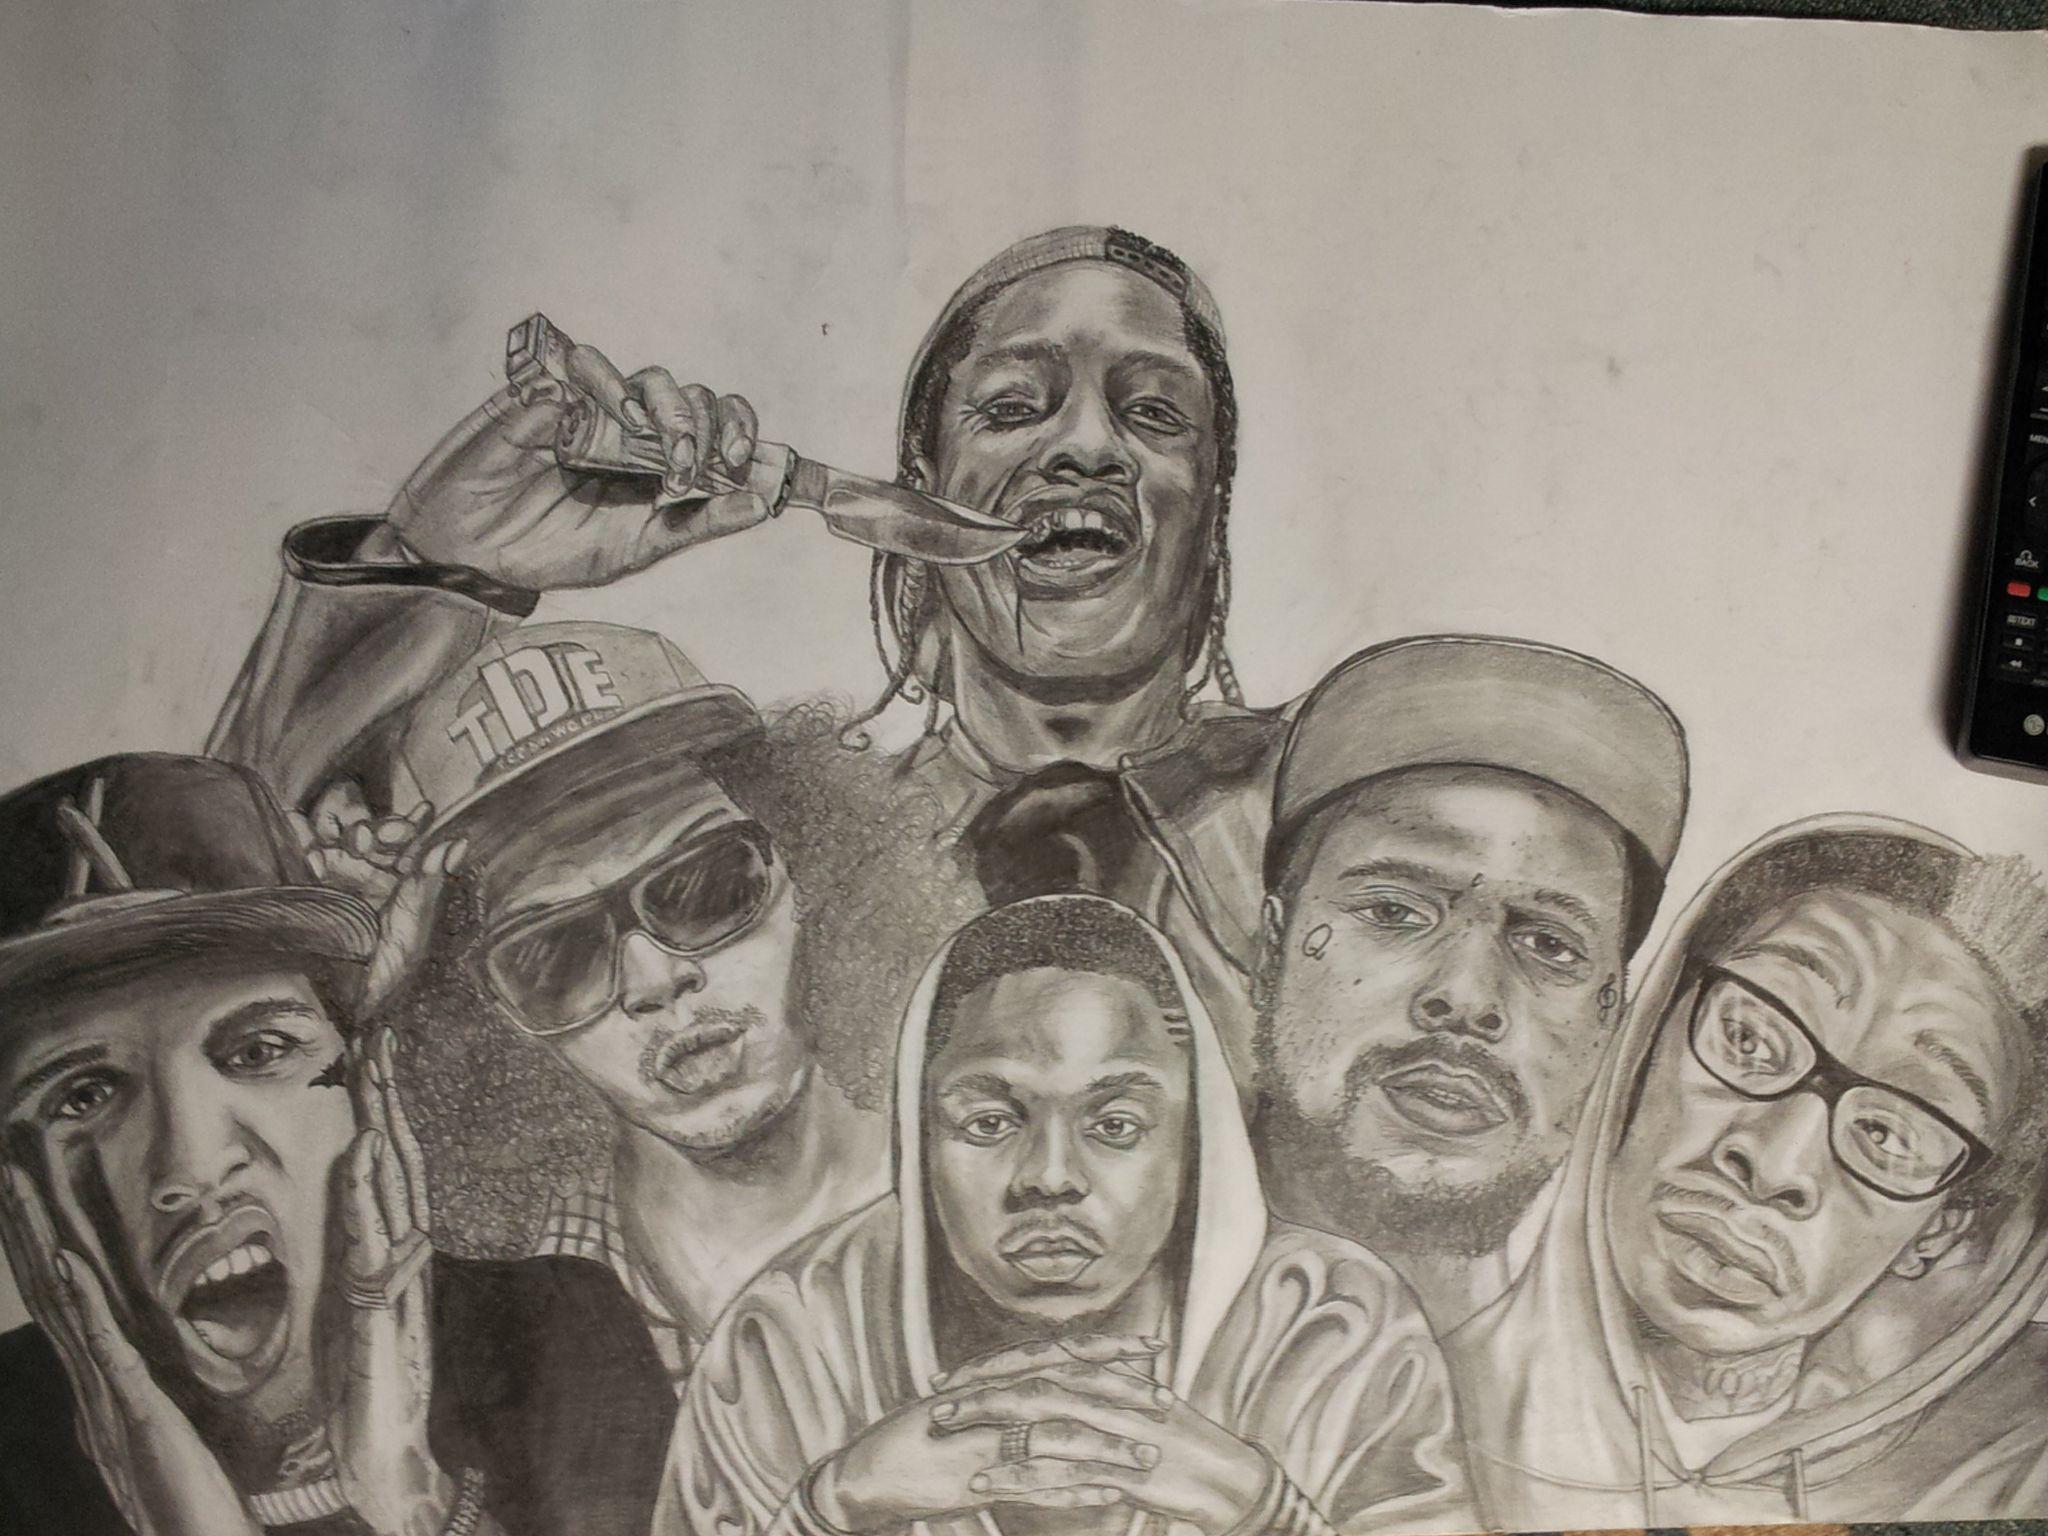 My favorite rappers in 2014 Asap Rocky, Ab-Soul, Kendrick ...